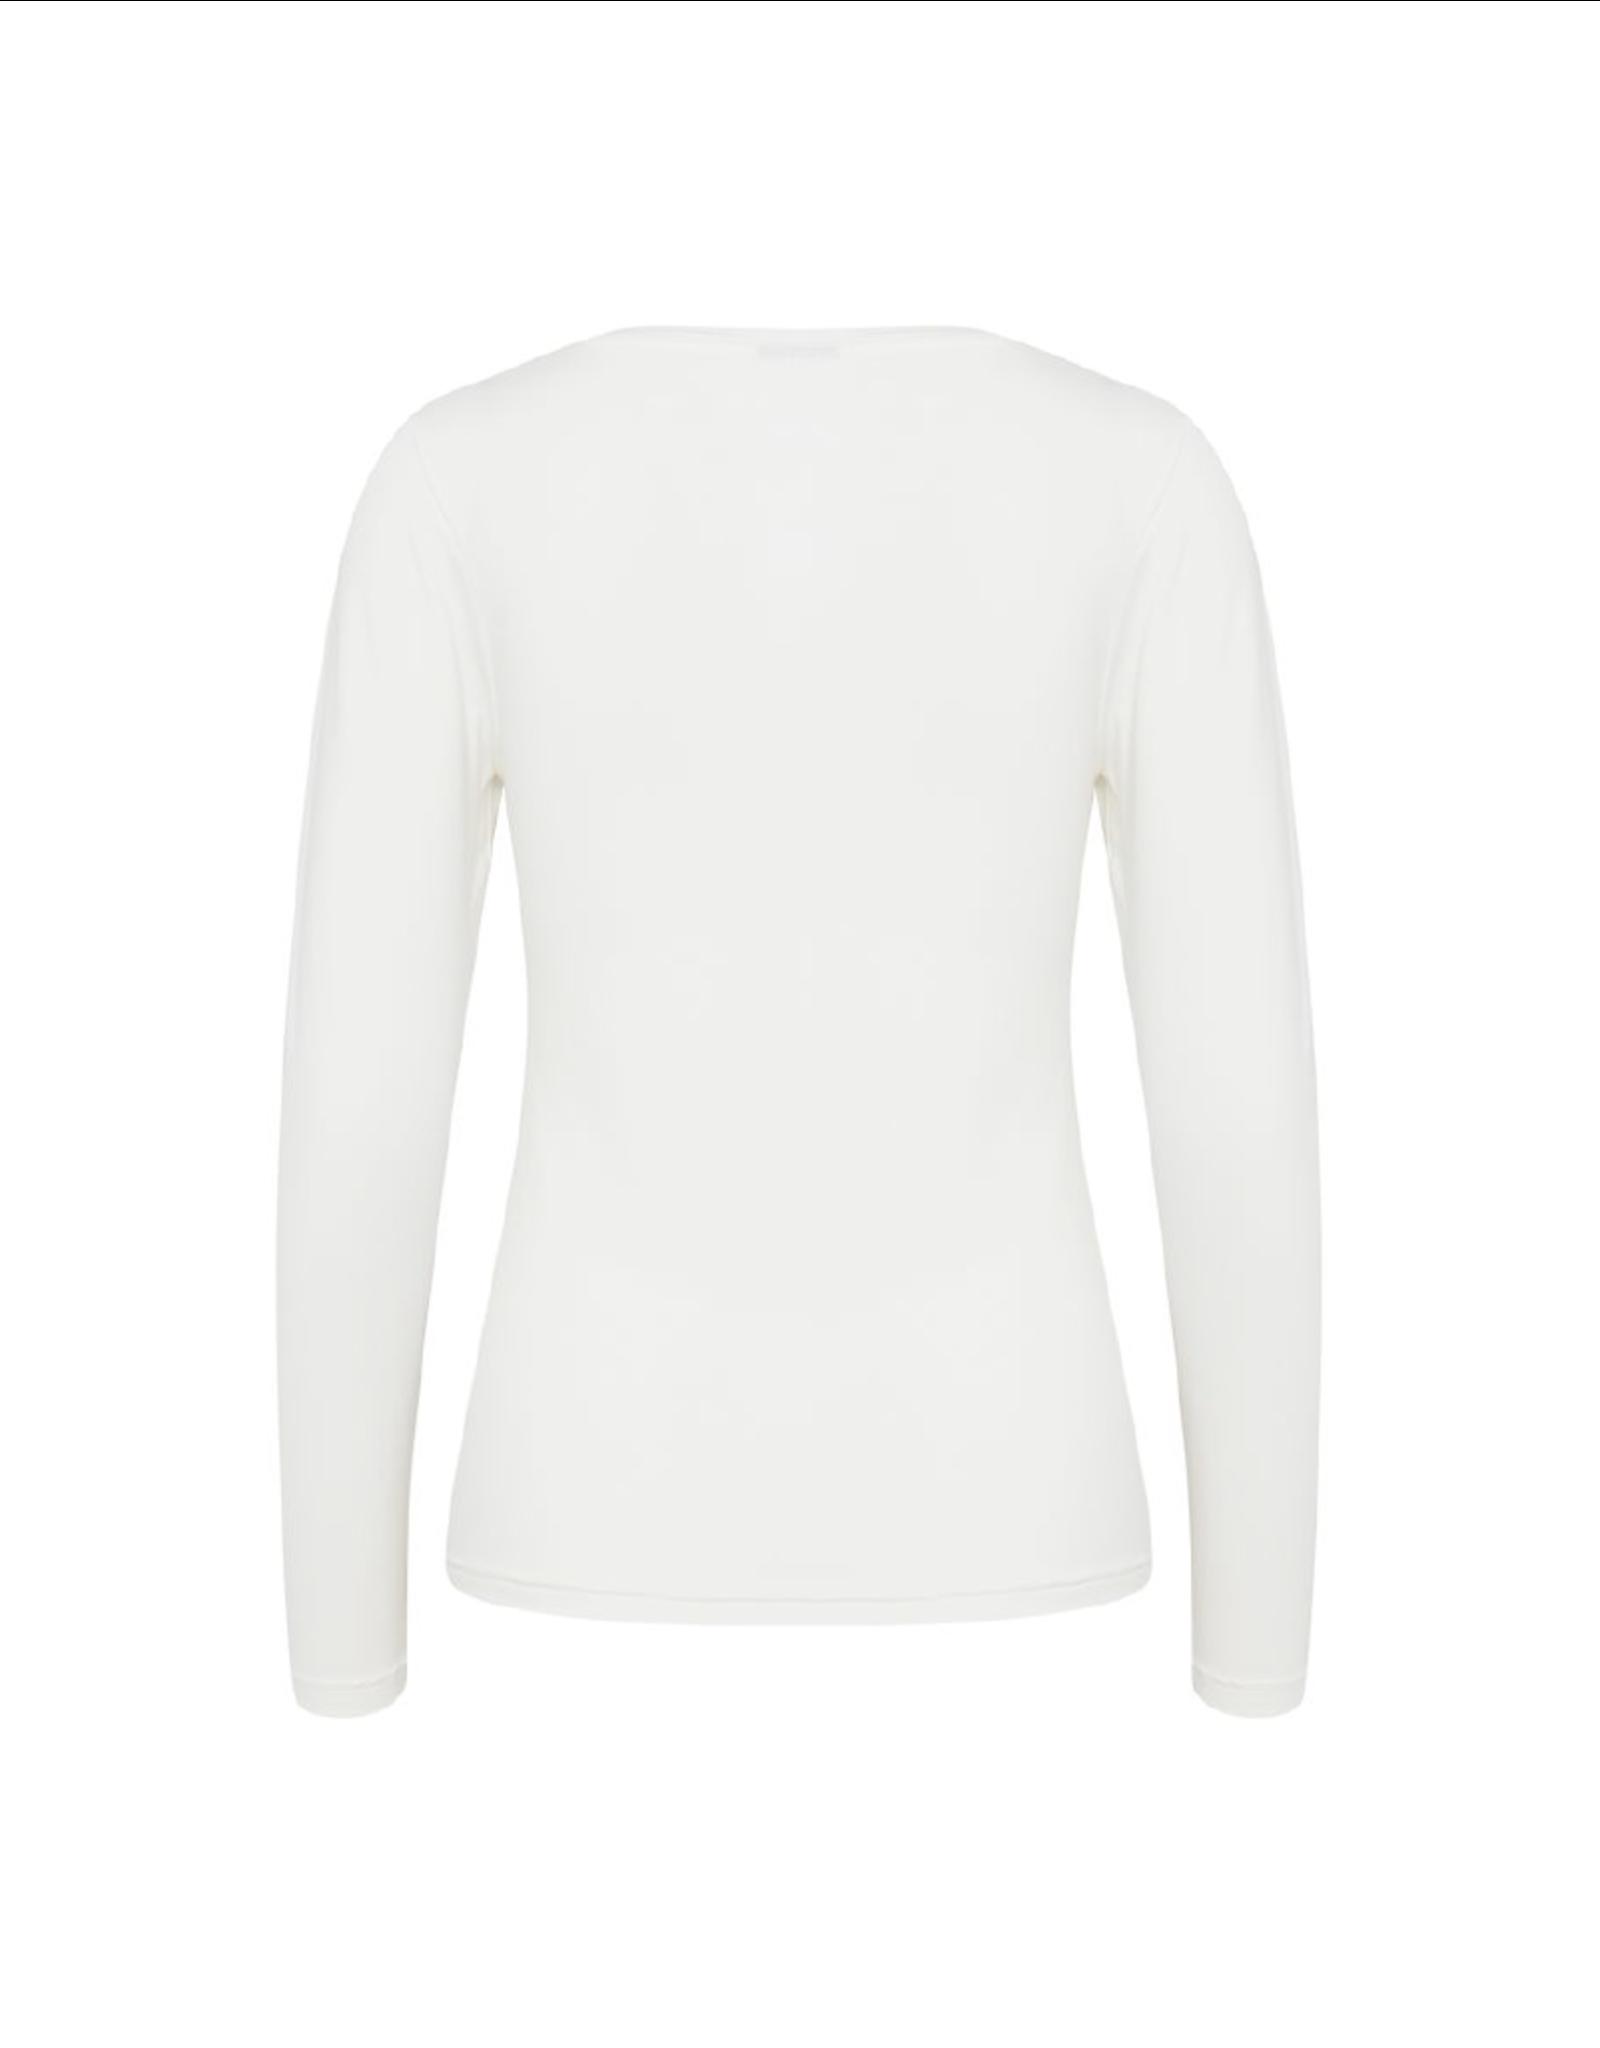 B. Young Organic Cotton Modal Long-Sleeve Top